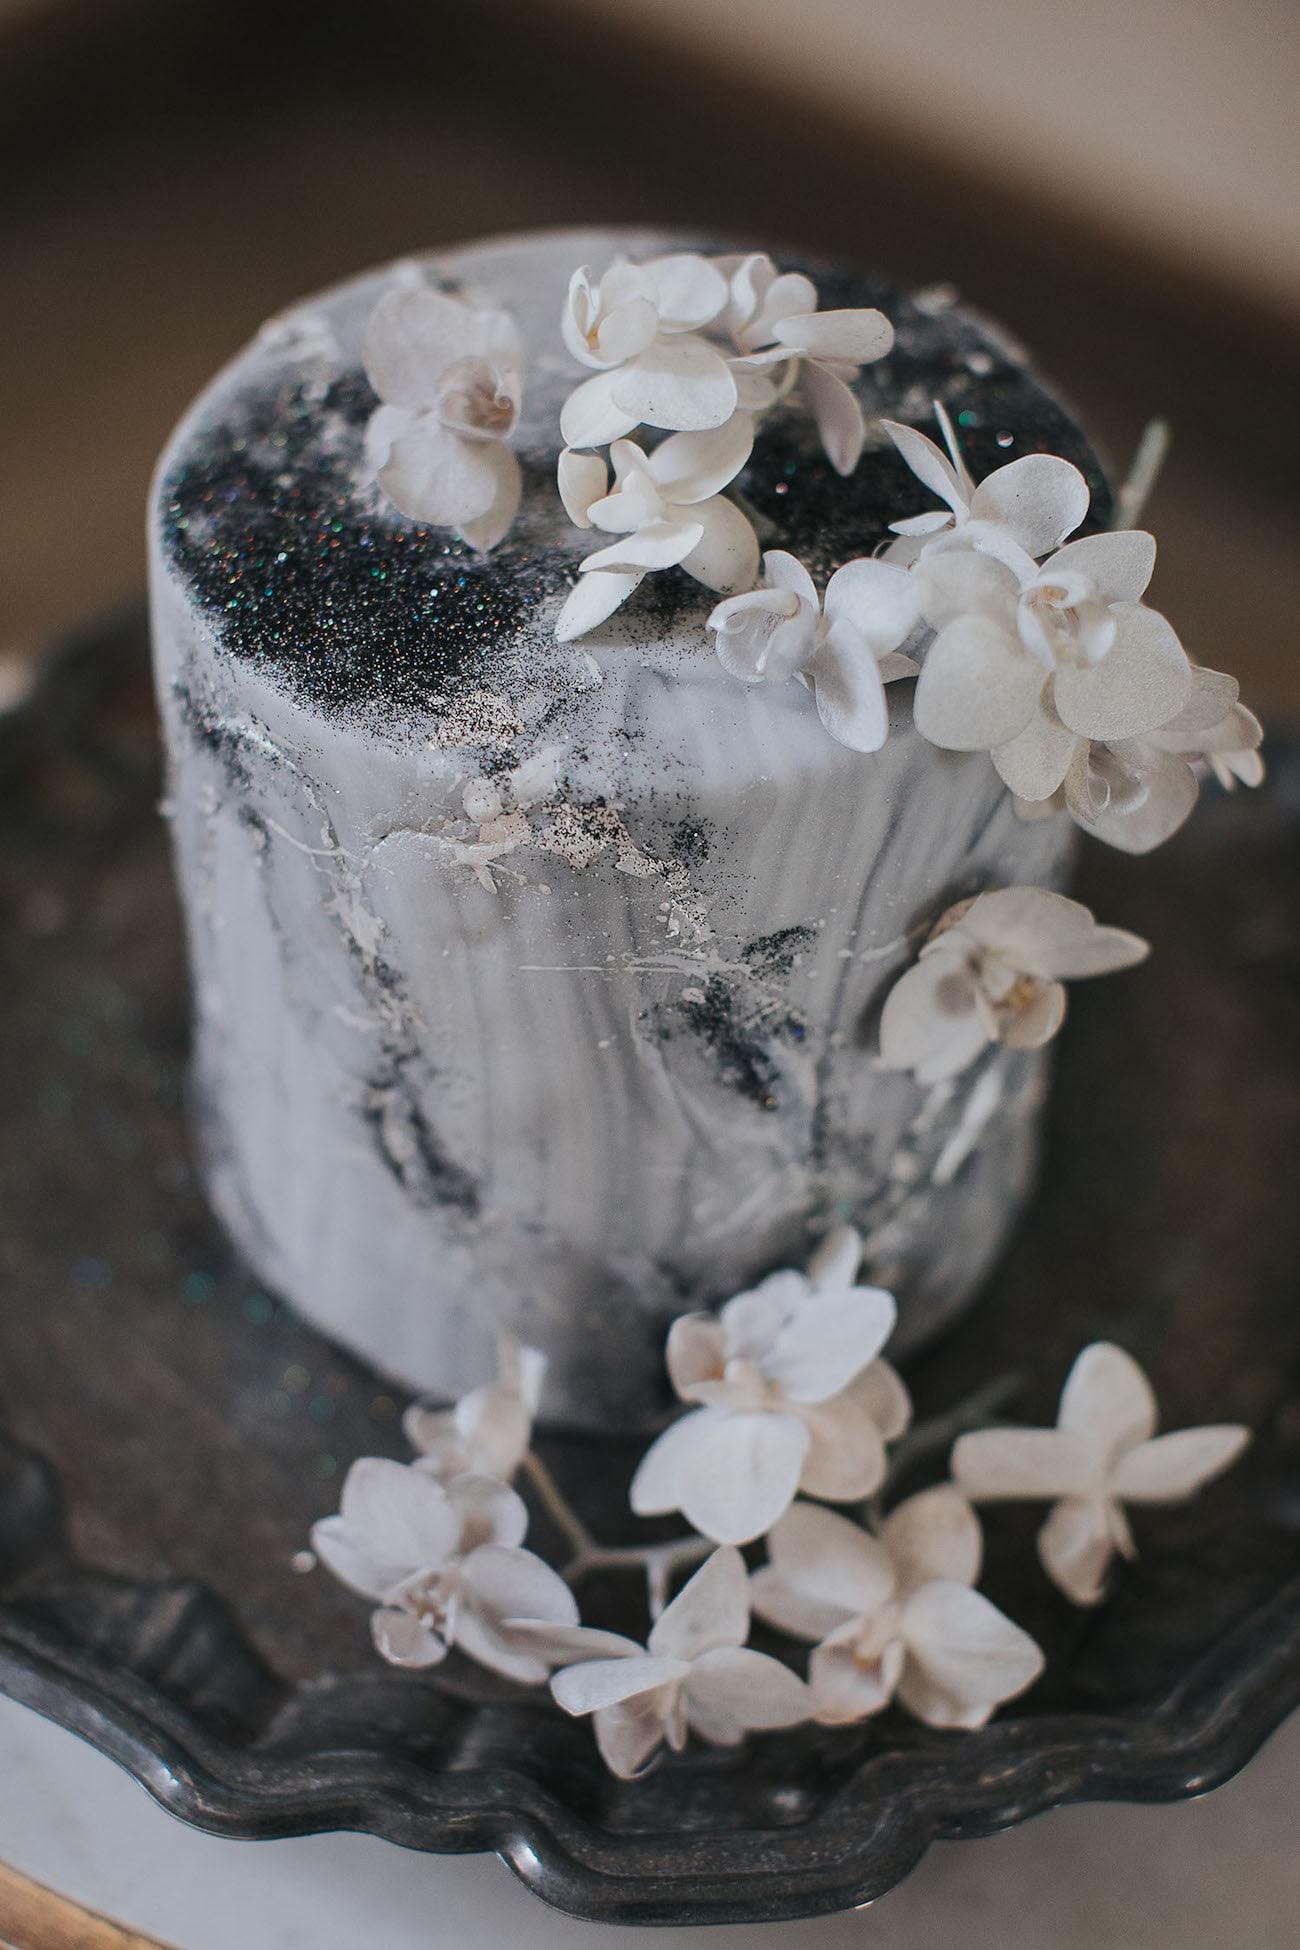 Celestial Themed Wedding Cake | Credit: Cornelia Lietz